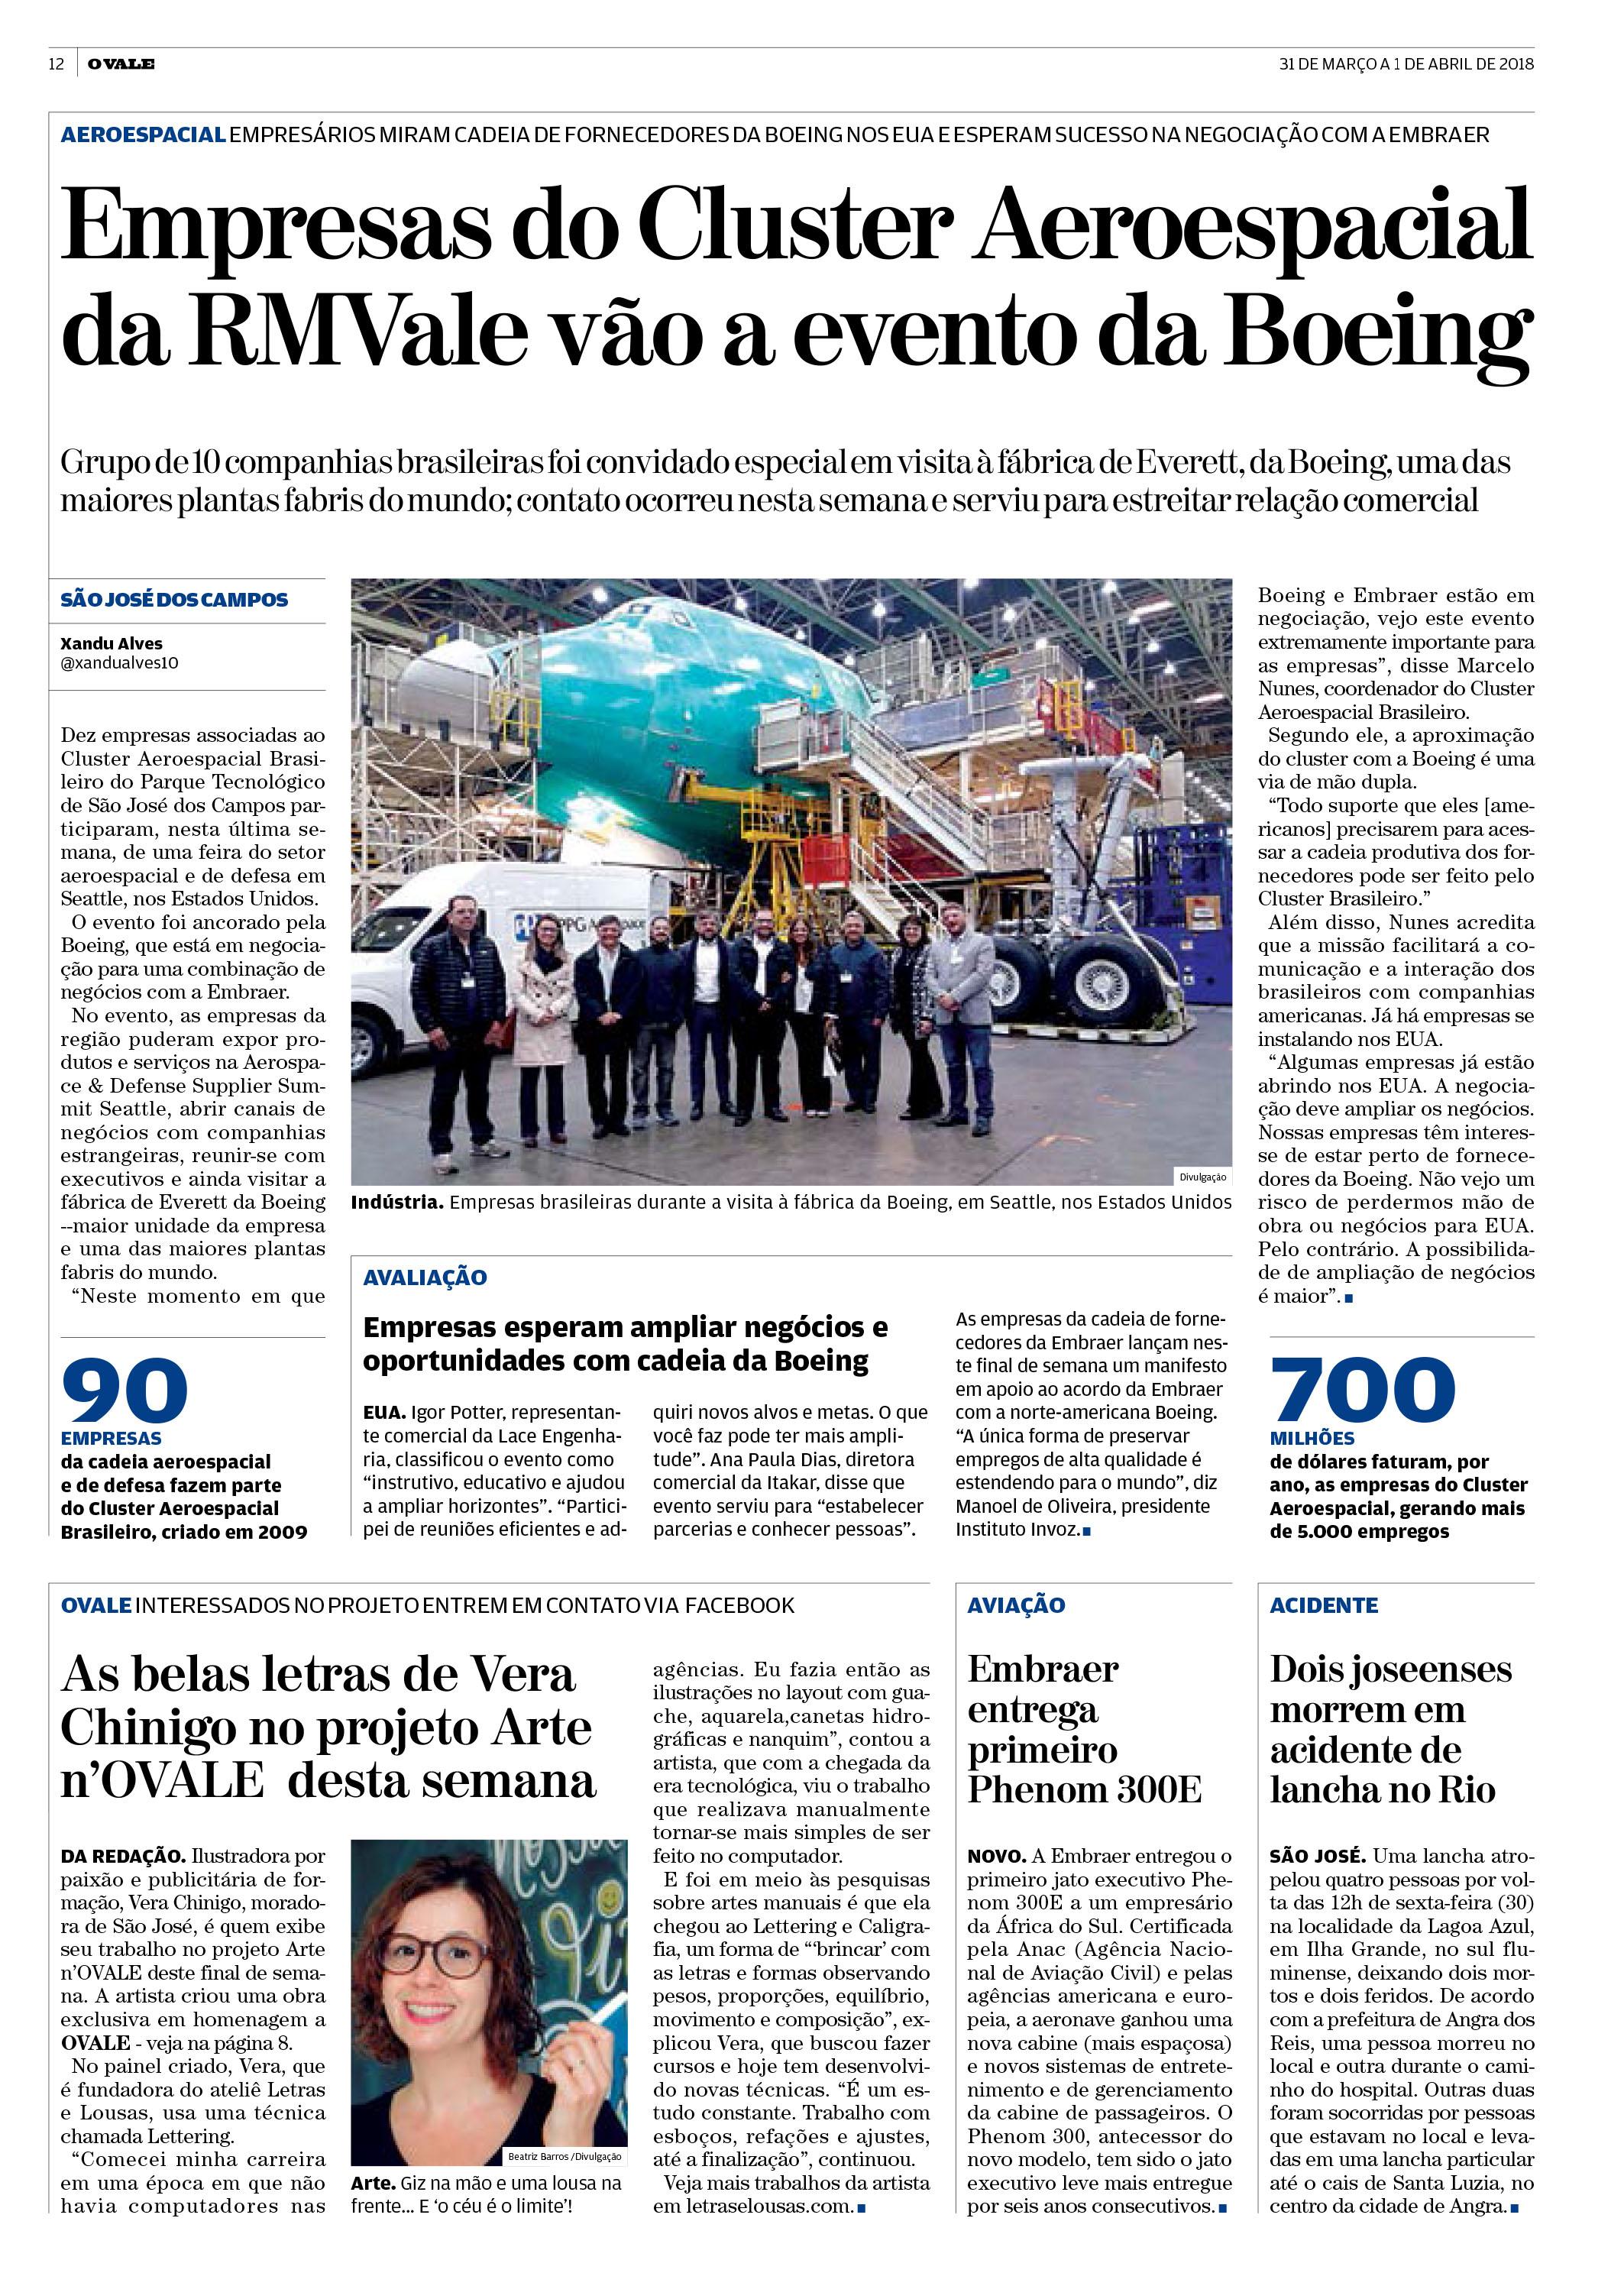 Matéria - Jornal OVALE - 30.3.2018